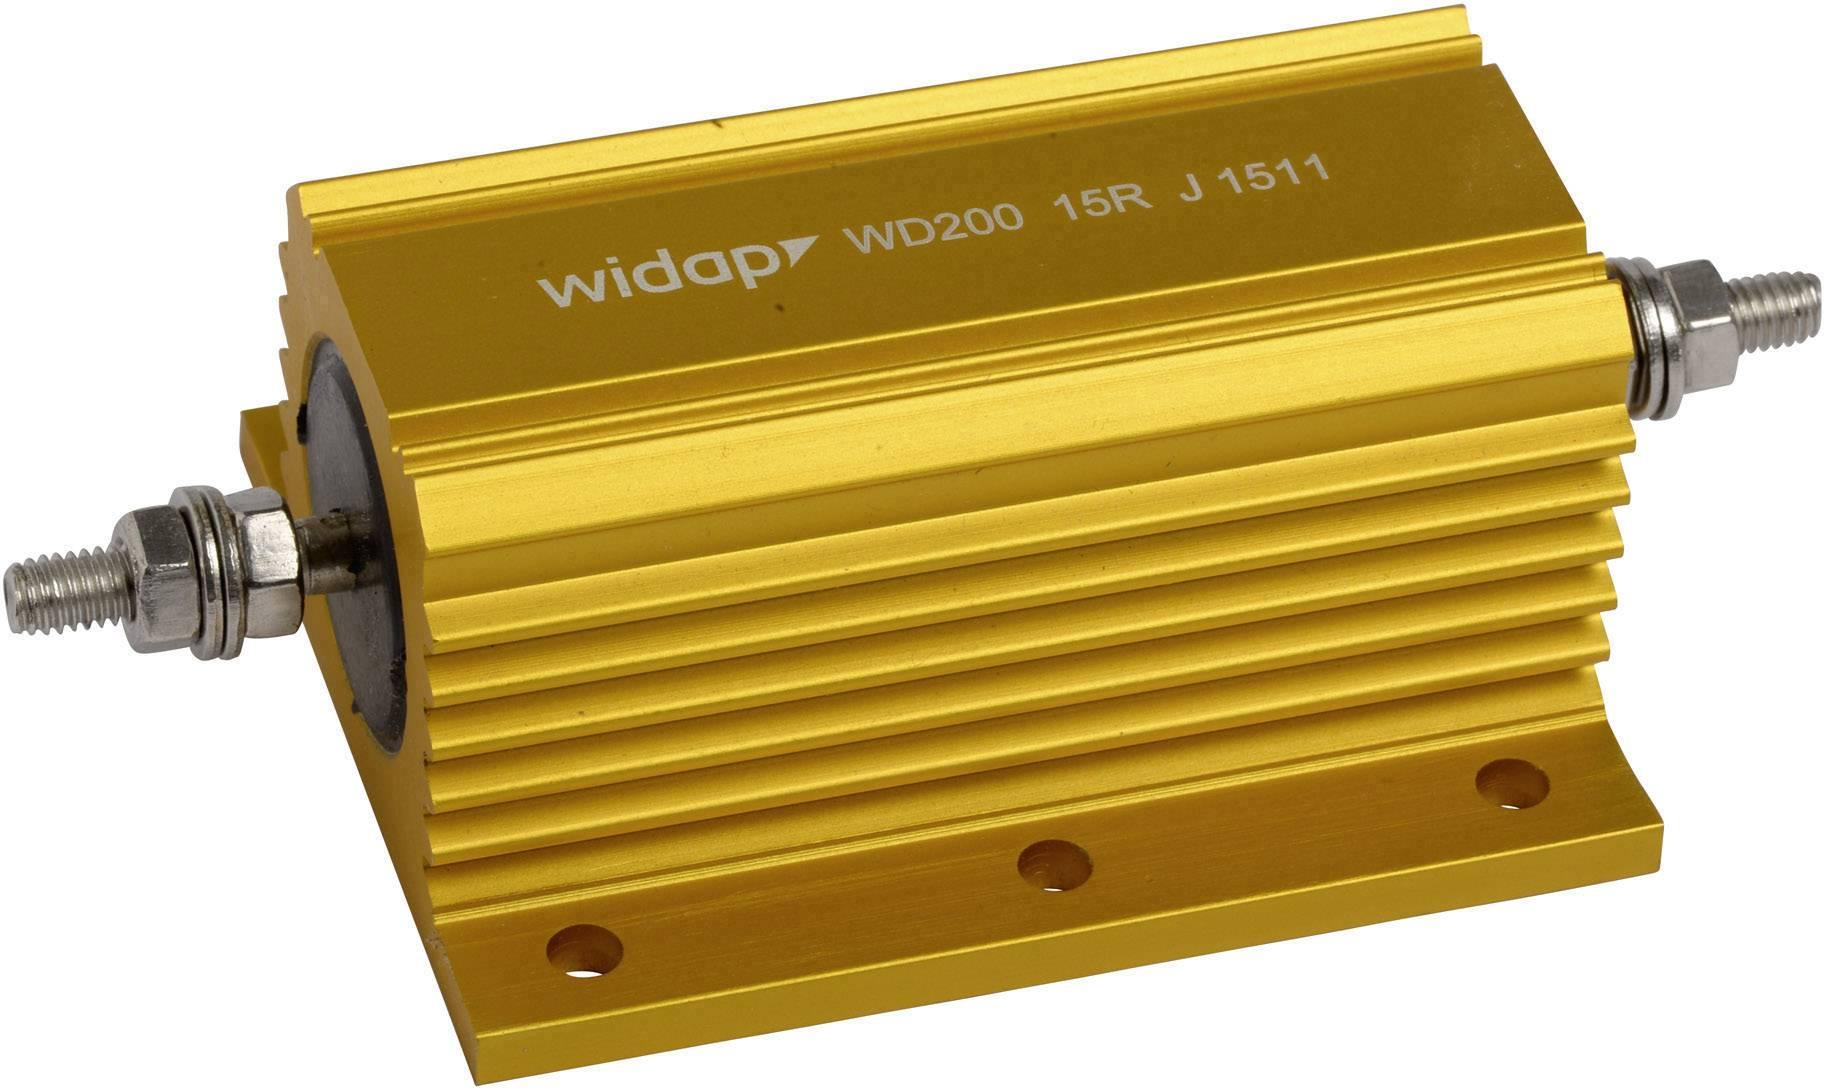 Drôtový rezistor Widap 160179, hodnota odporu 100 Ohm, 300 W, 1 ks